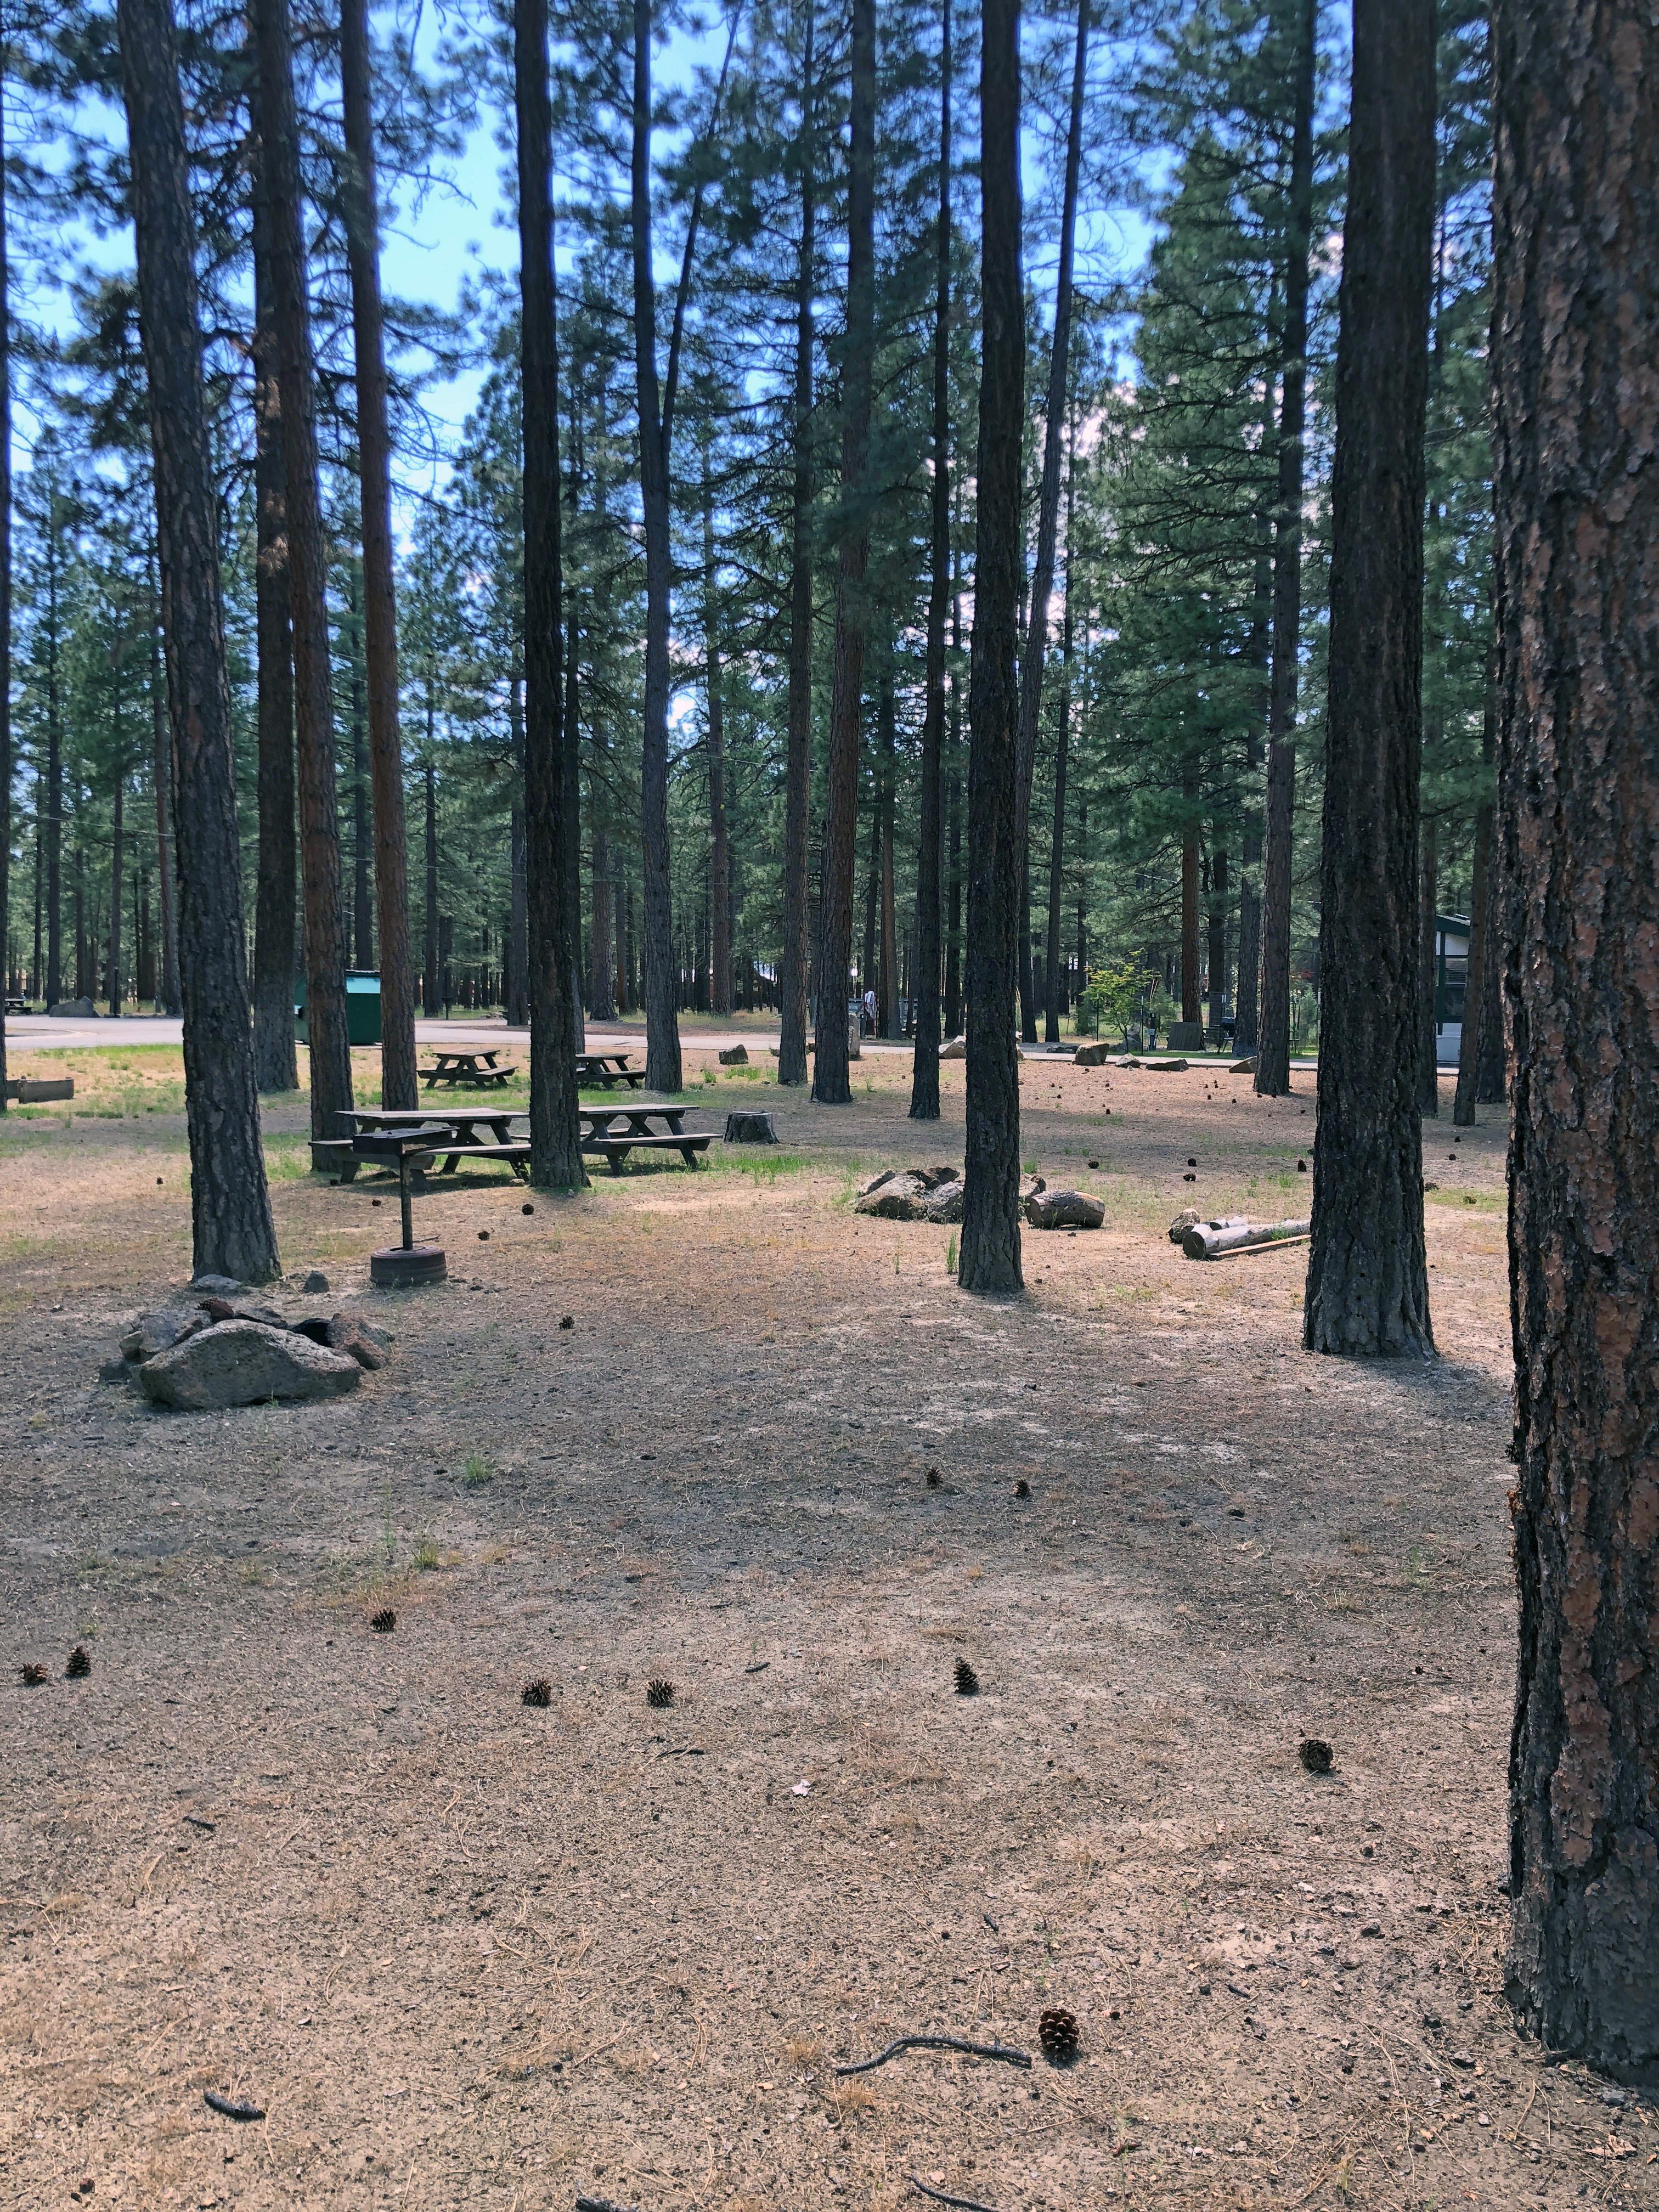 Tent Campsite in Clean Park with Amenities Tält att hyra i